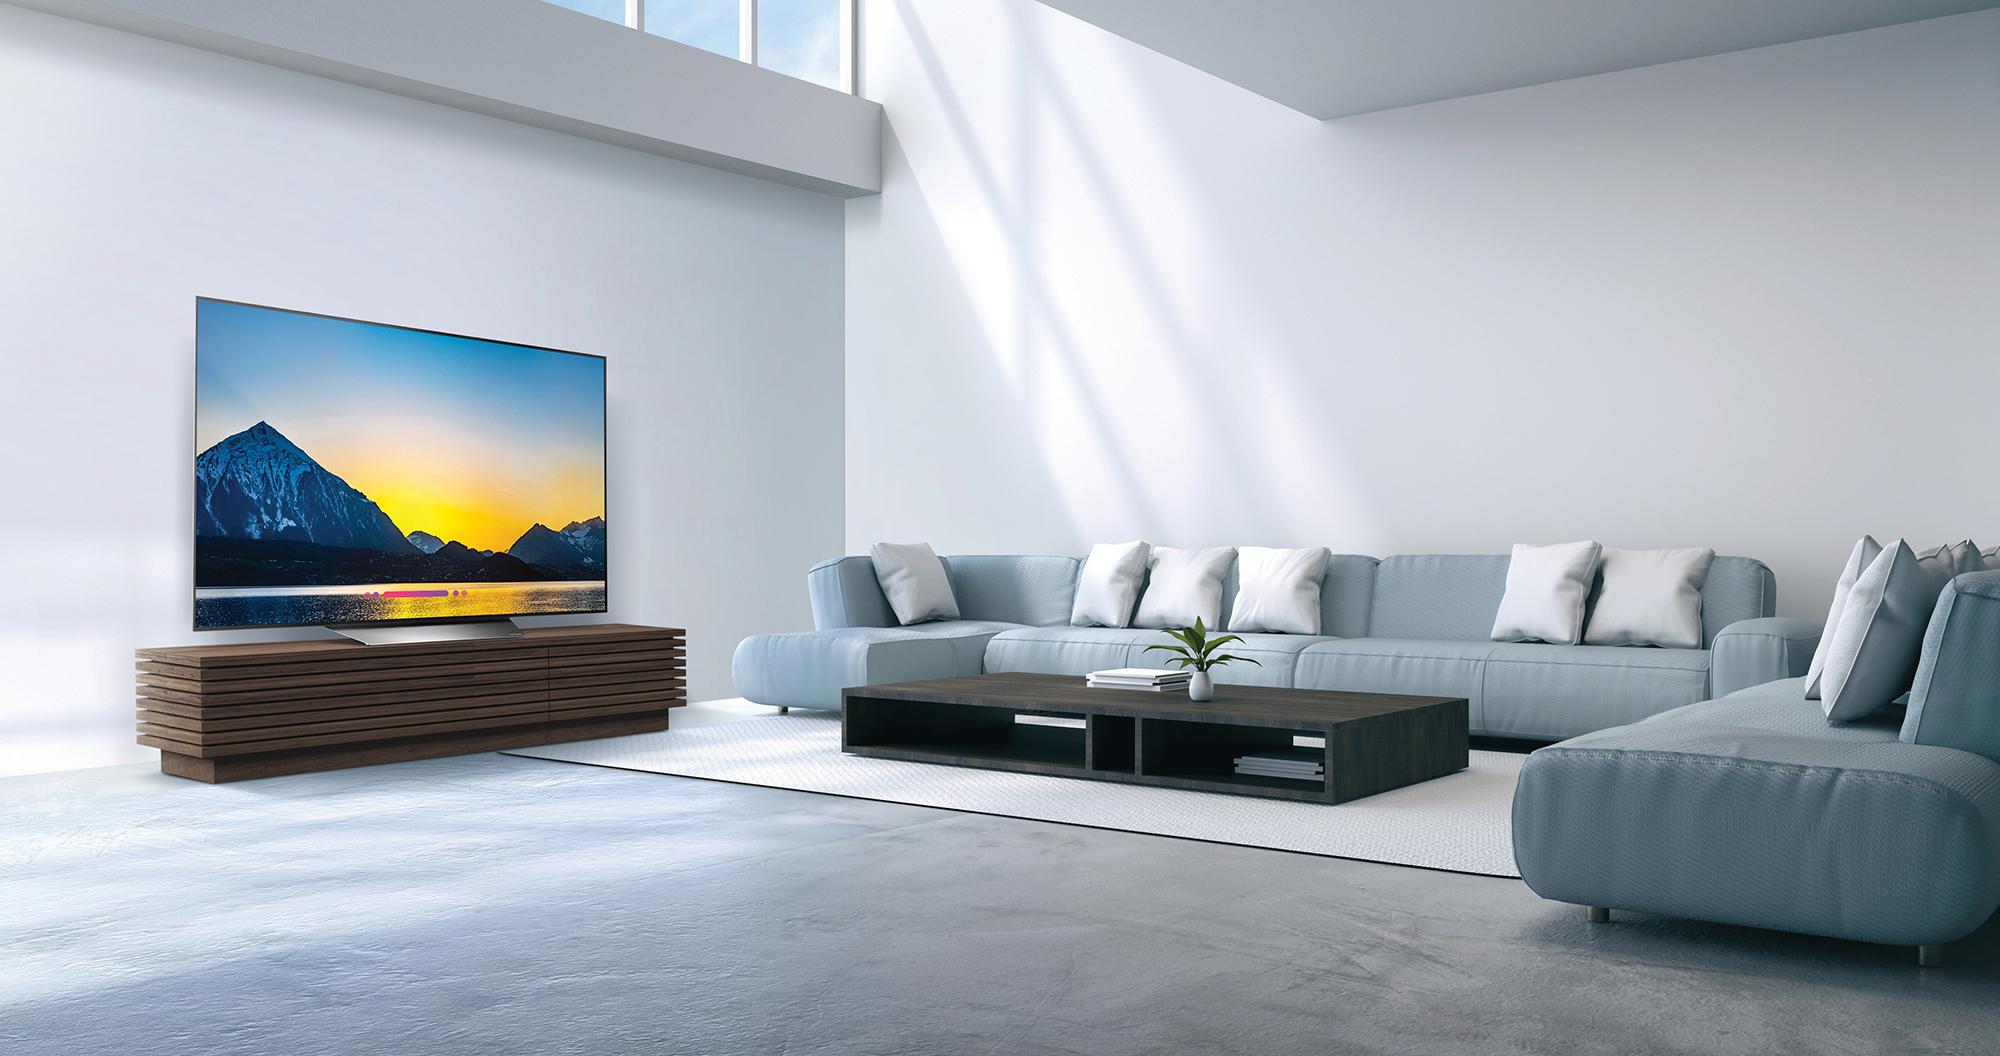 LG B8 TV Overview   Best Buy Blog